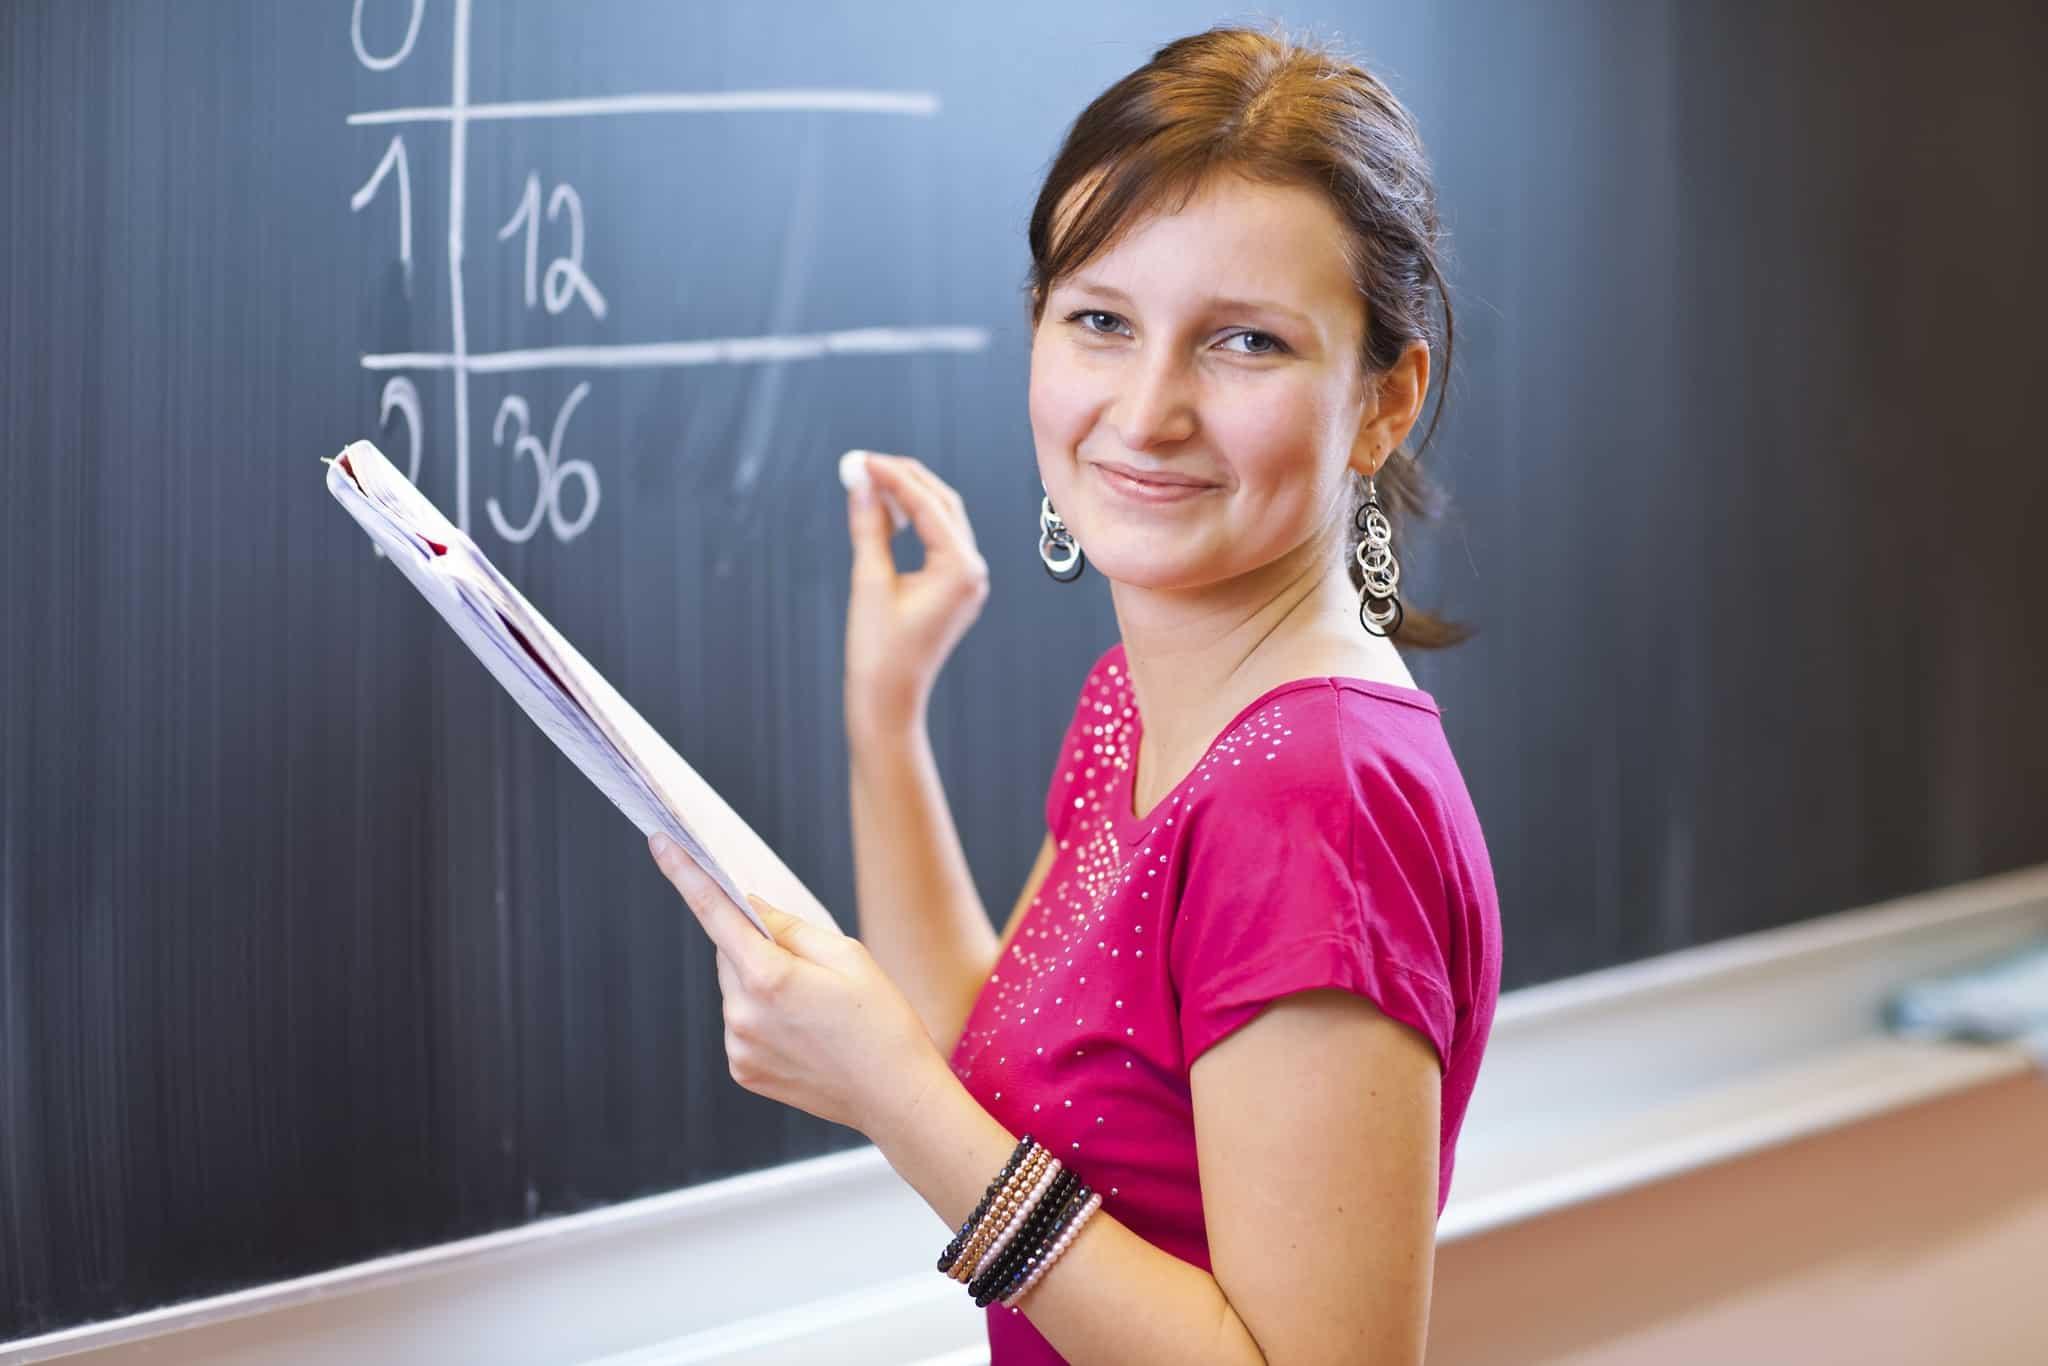 A Caucasian female math teacher